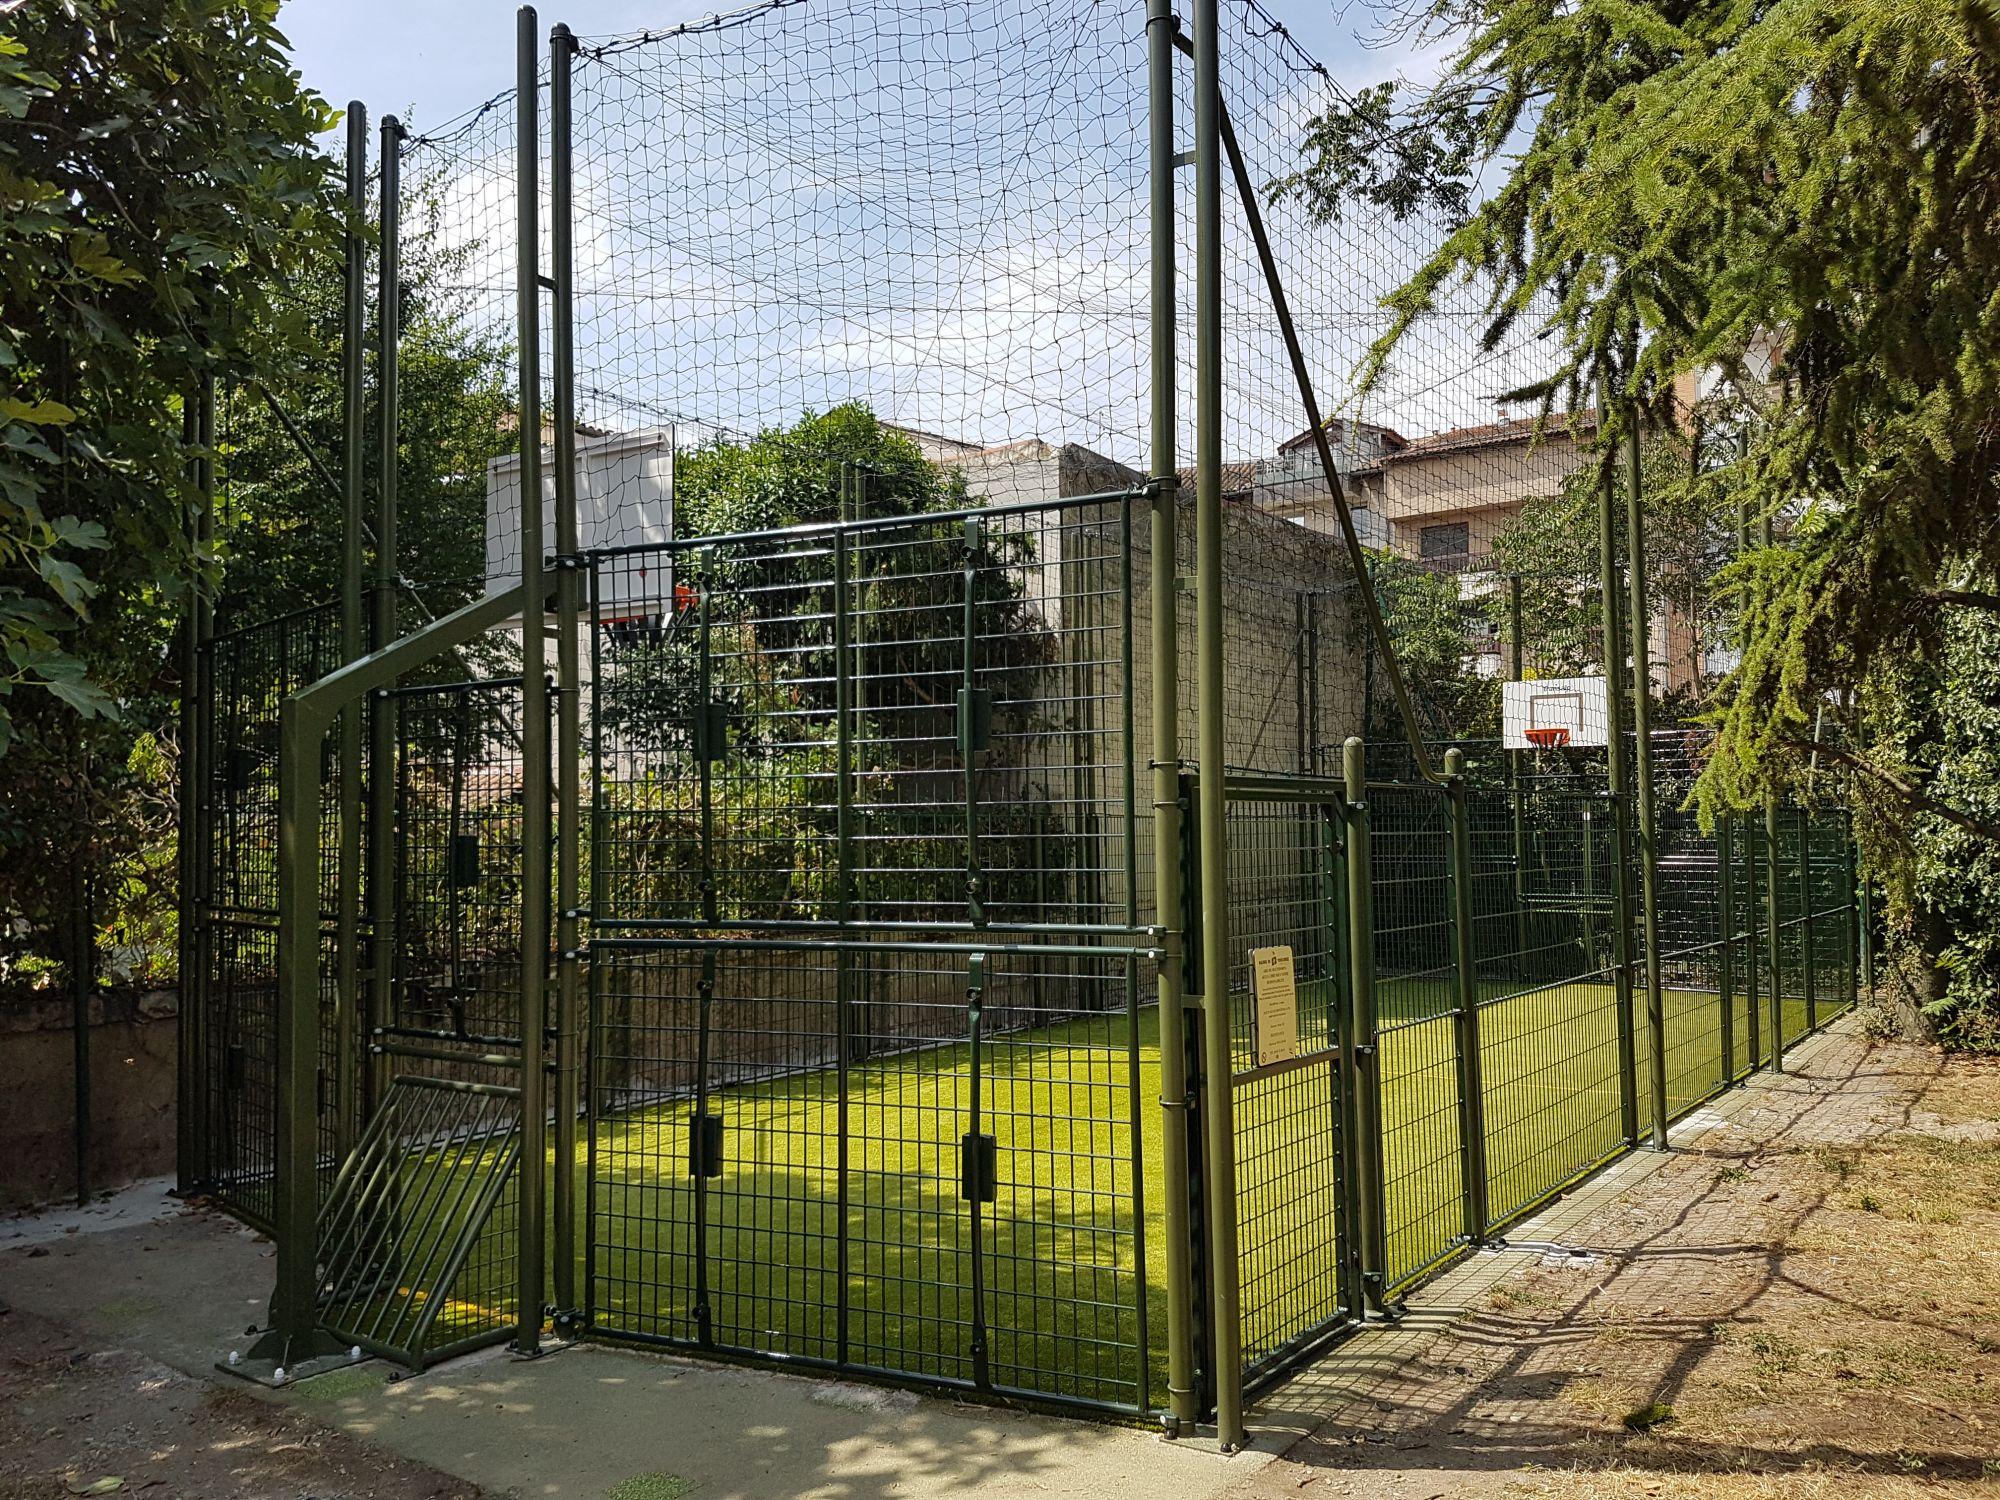 terrain multi sports jardin d'embarthe Toulouse Haute Garonne